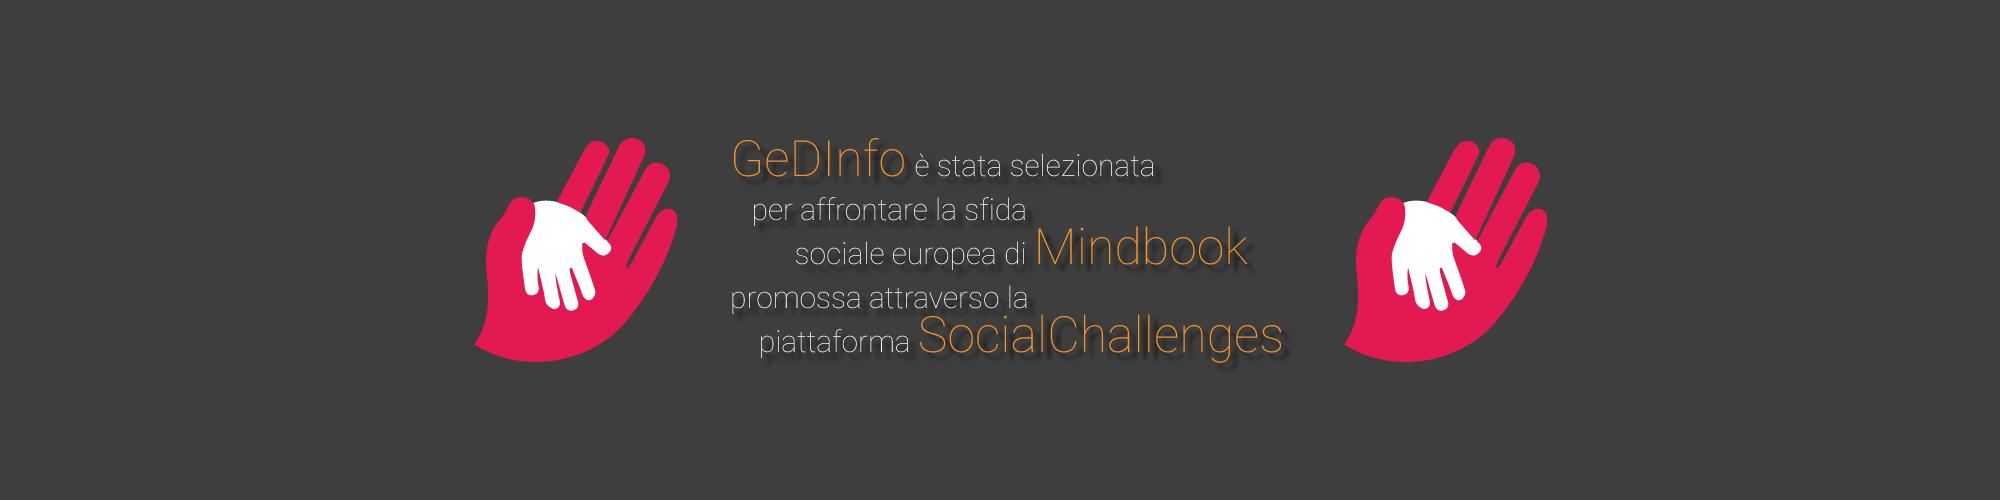 Mindbook App Social Challenge